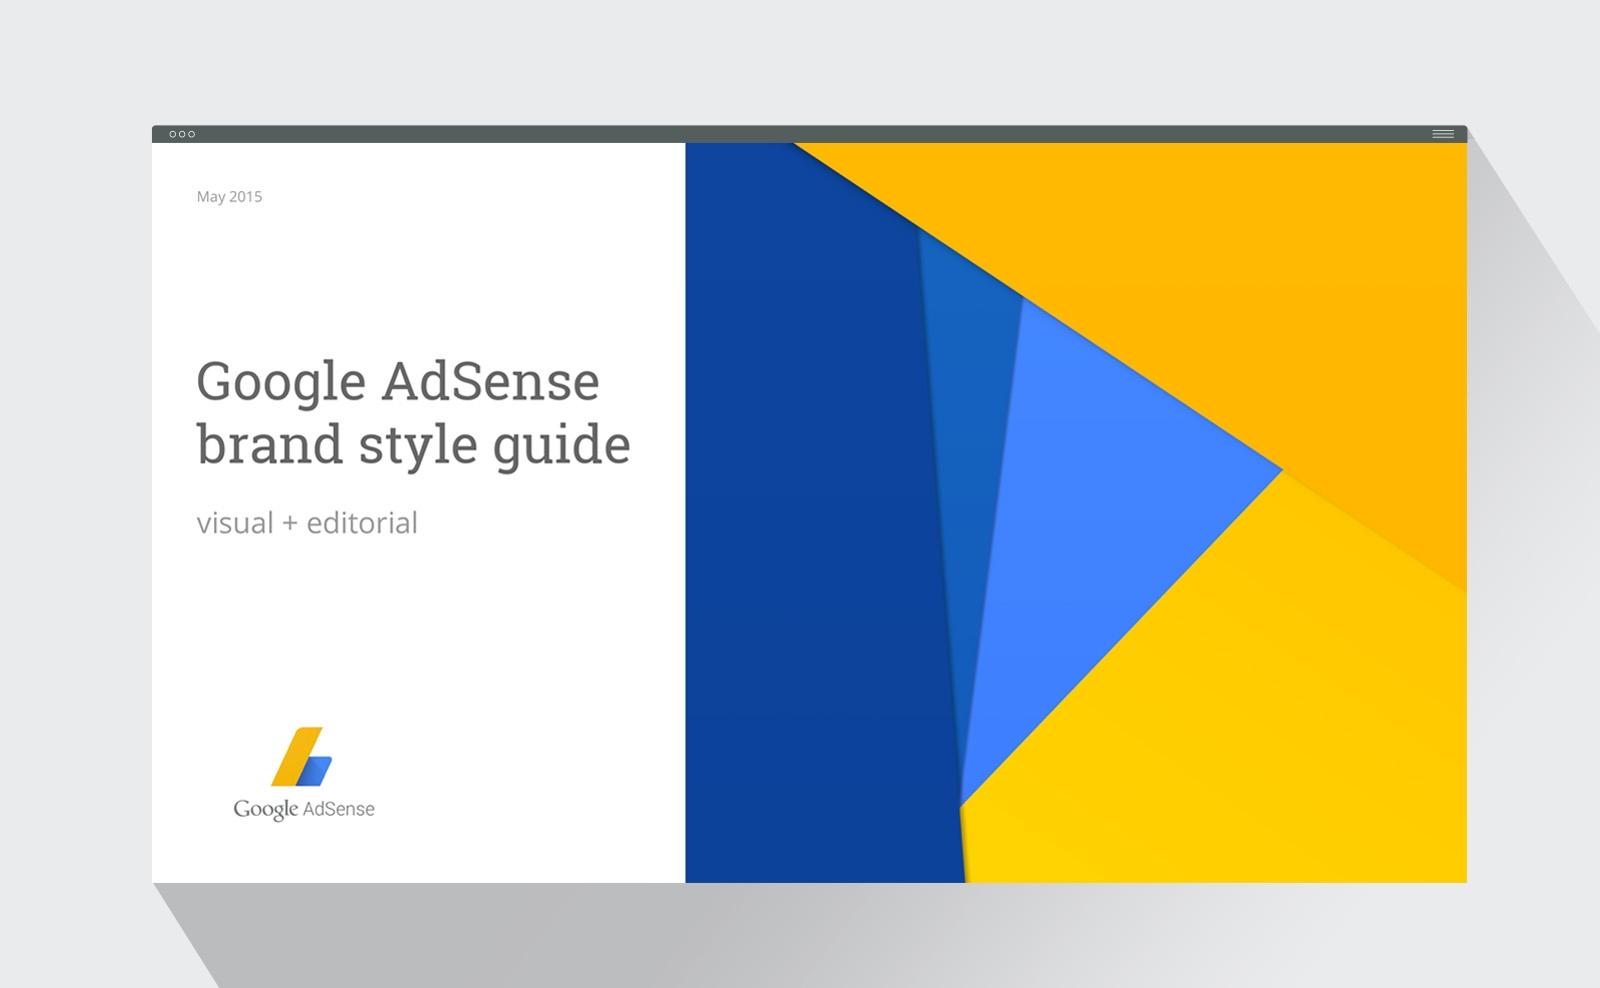 Google AdSense brand style guide design presentation